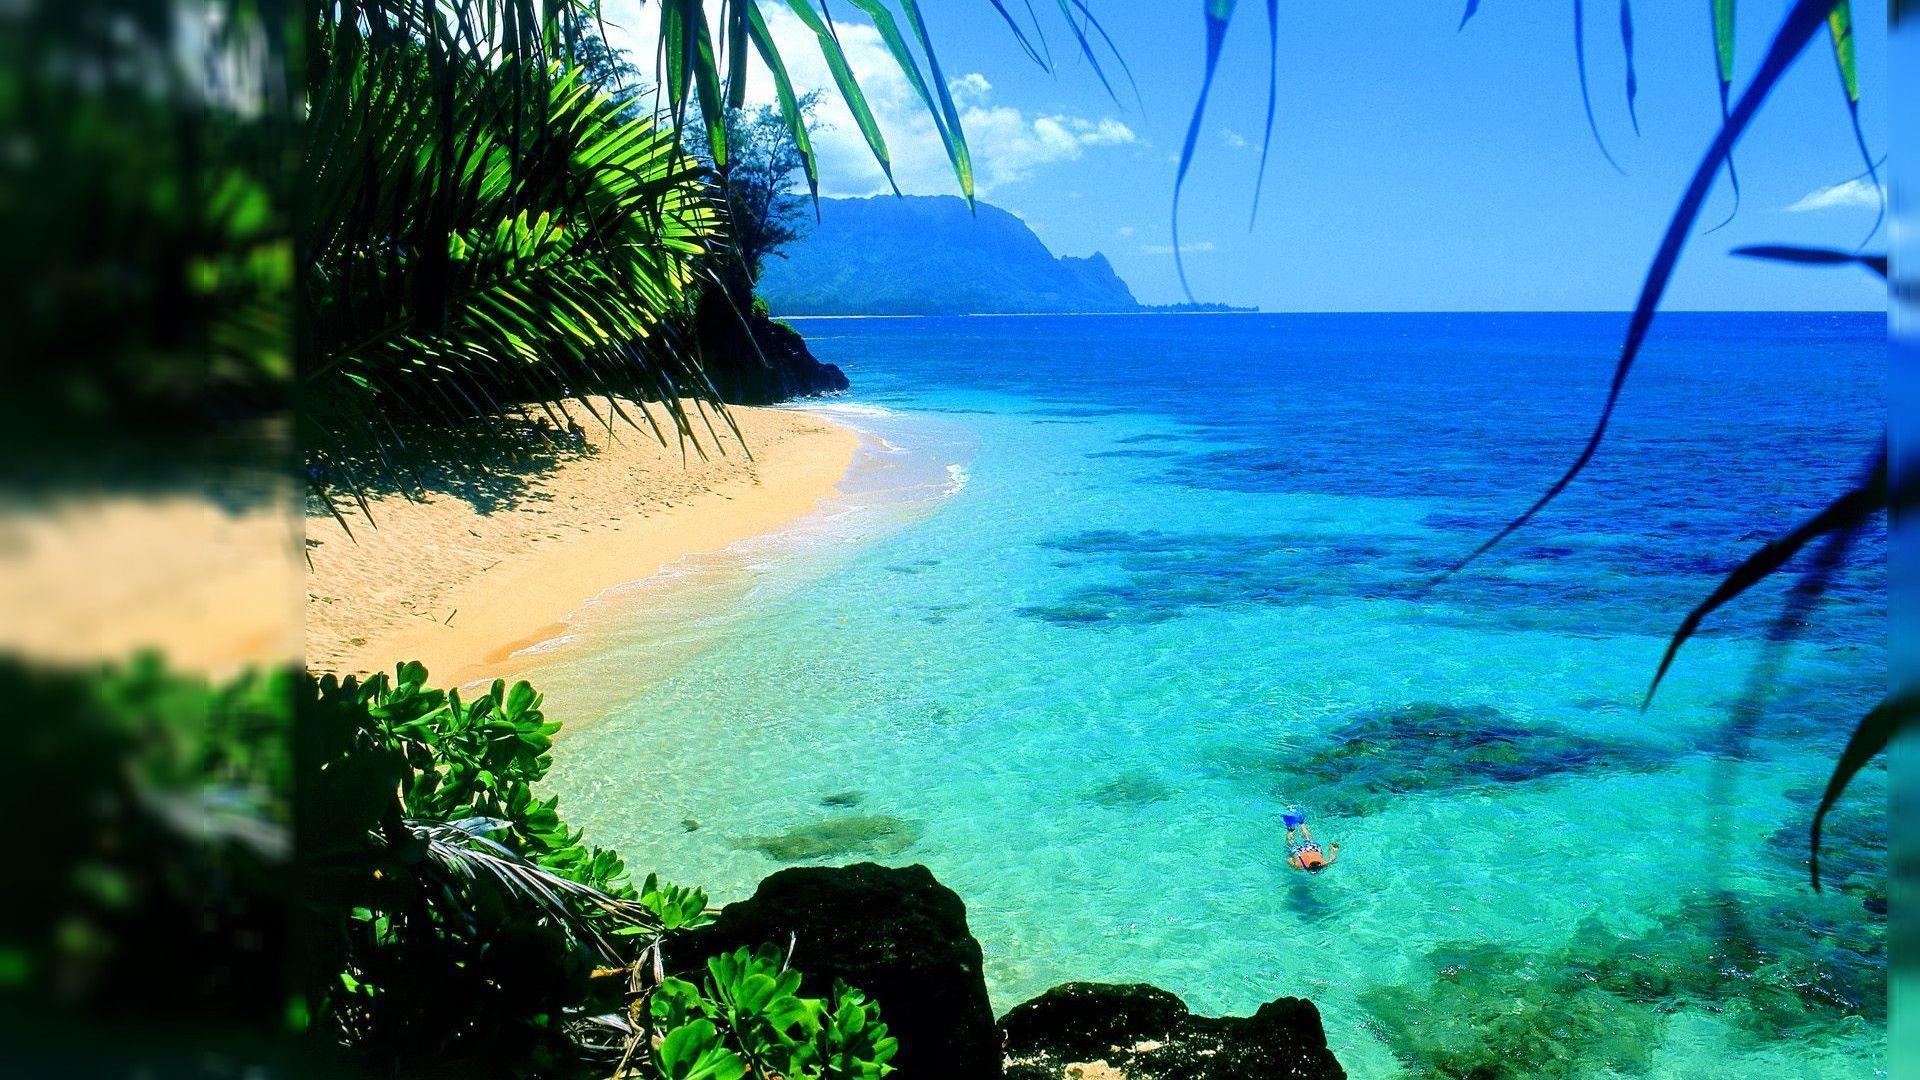 HD Tropical Island Wallpapers for Desktop